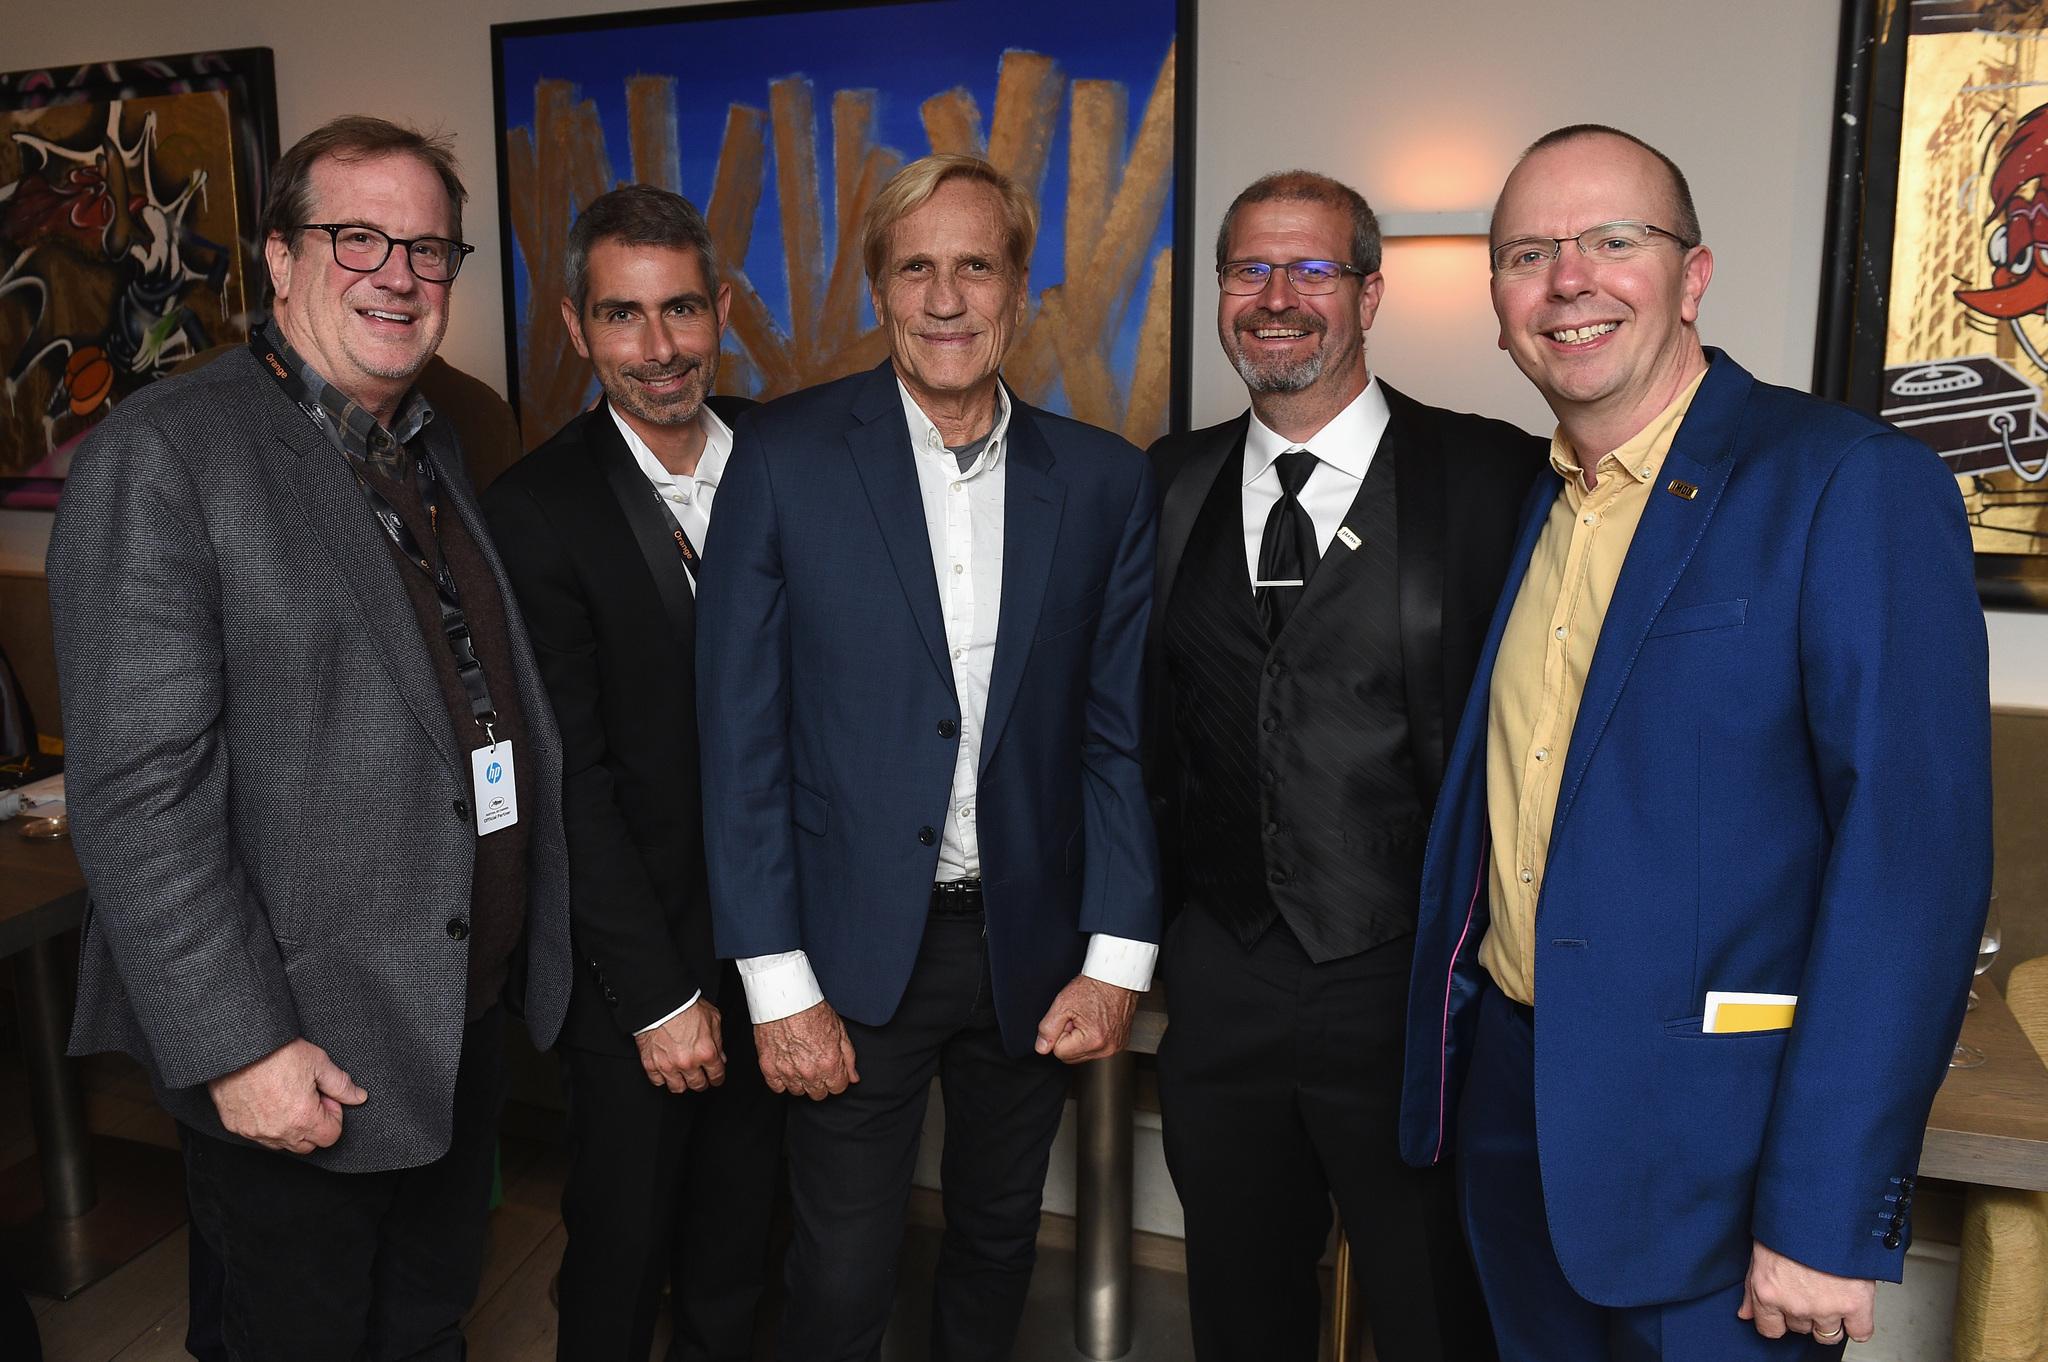 Randal Kleiser, Col Needham, Pete Hammond, and Keith Simanton